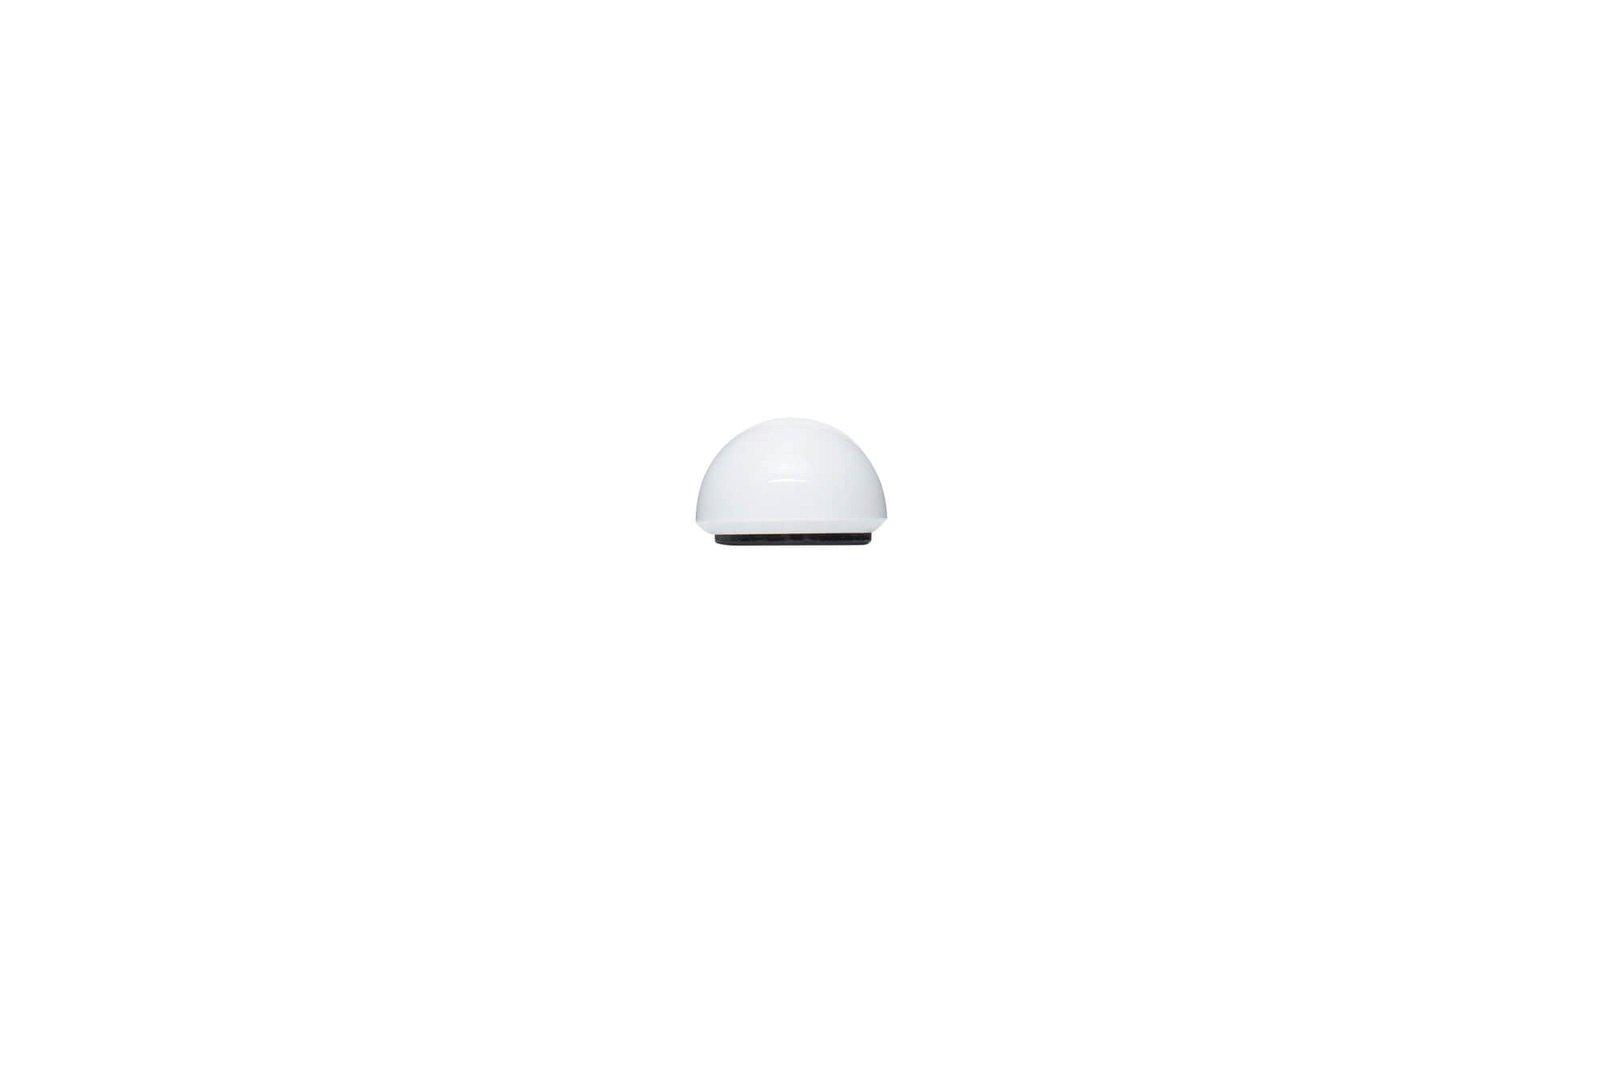 Kugel-Magnet Ø 30 mm, 0,6 kg Haftkraft, 10 St./Set, weiß